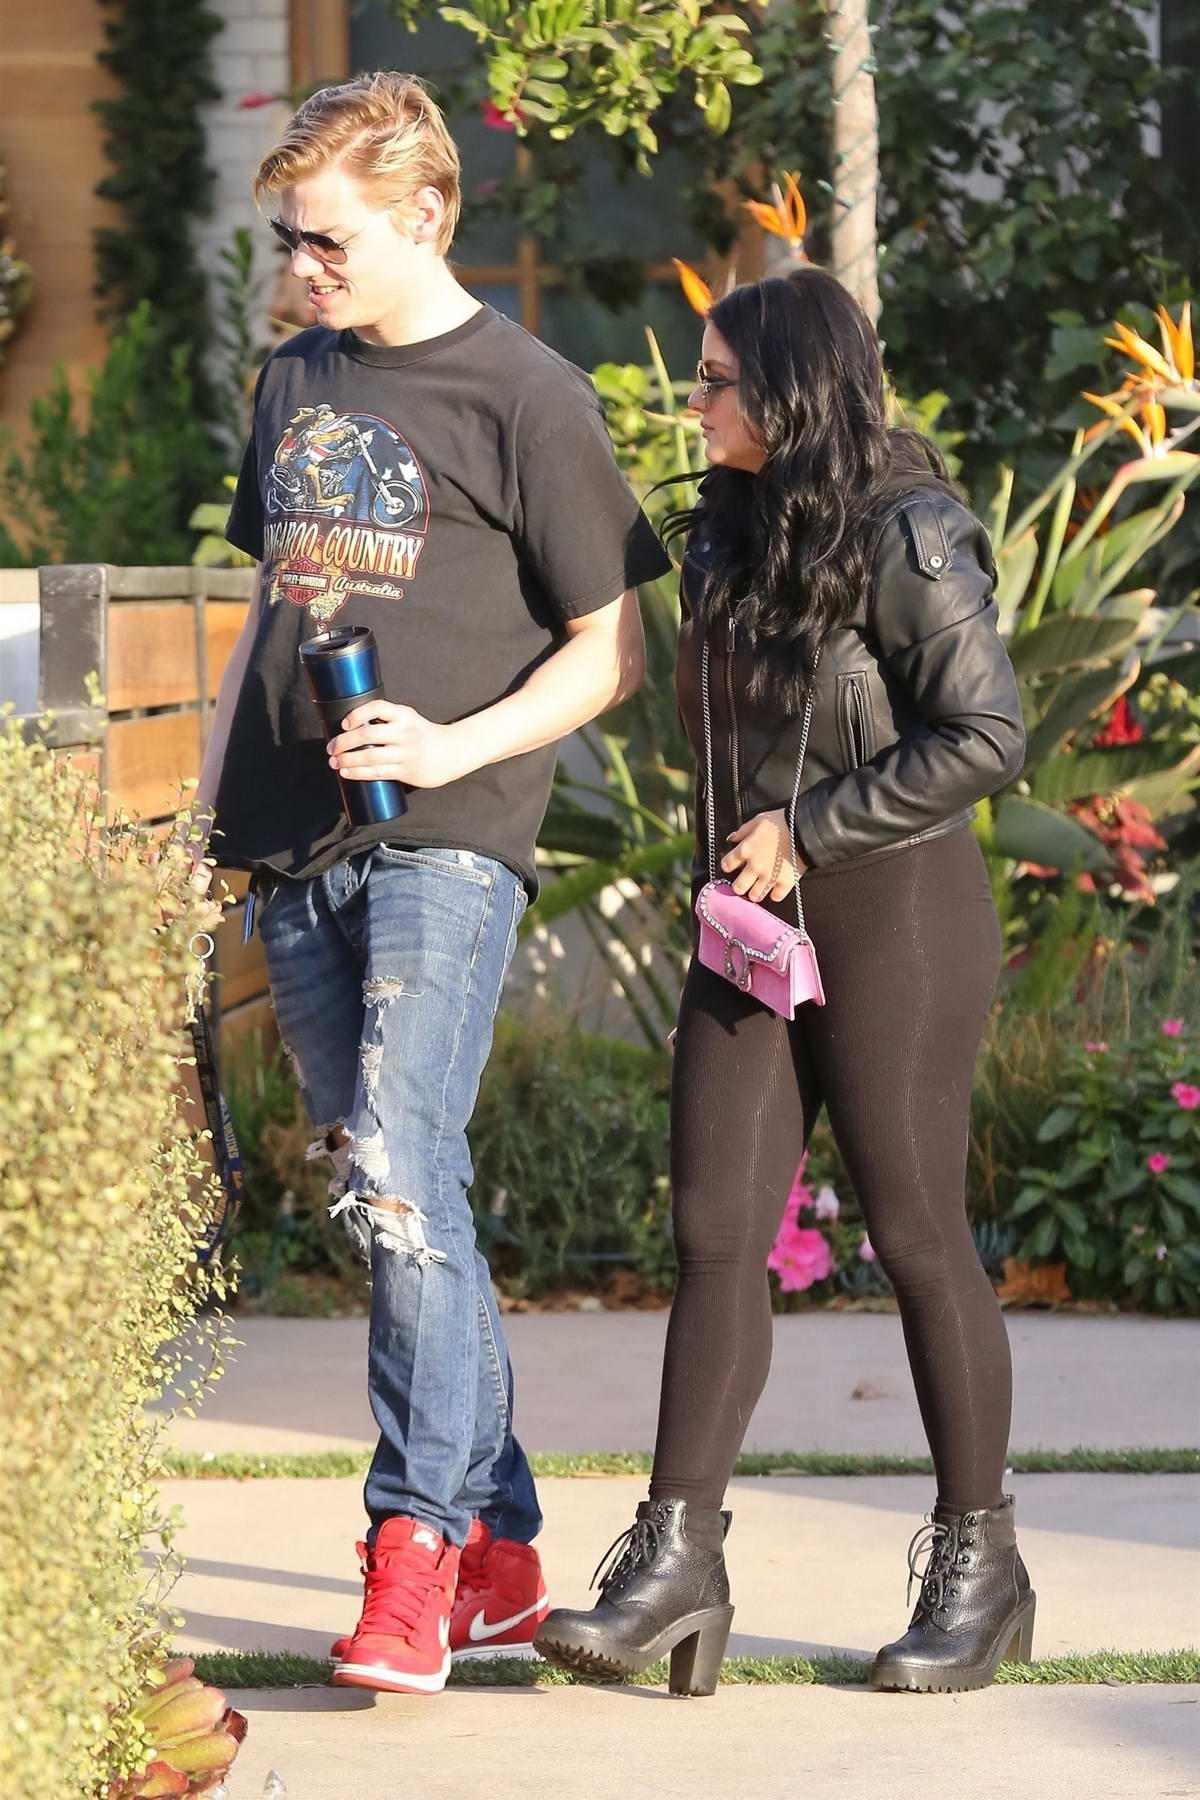 Ariel Winter dressed in all black stop by a friends house with boyfriend Levi Meaden in Studio City, Los Angeles